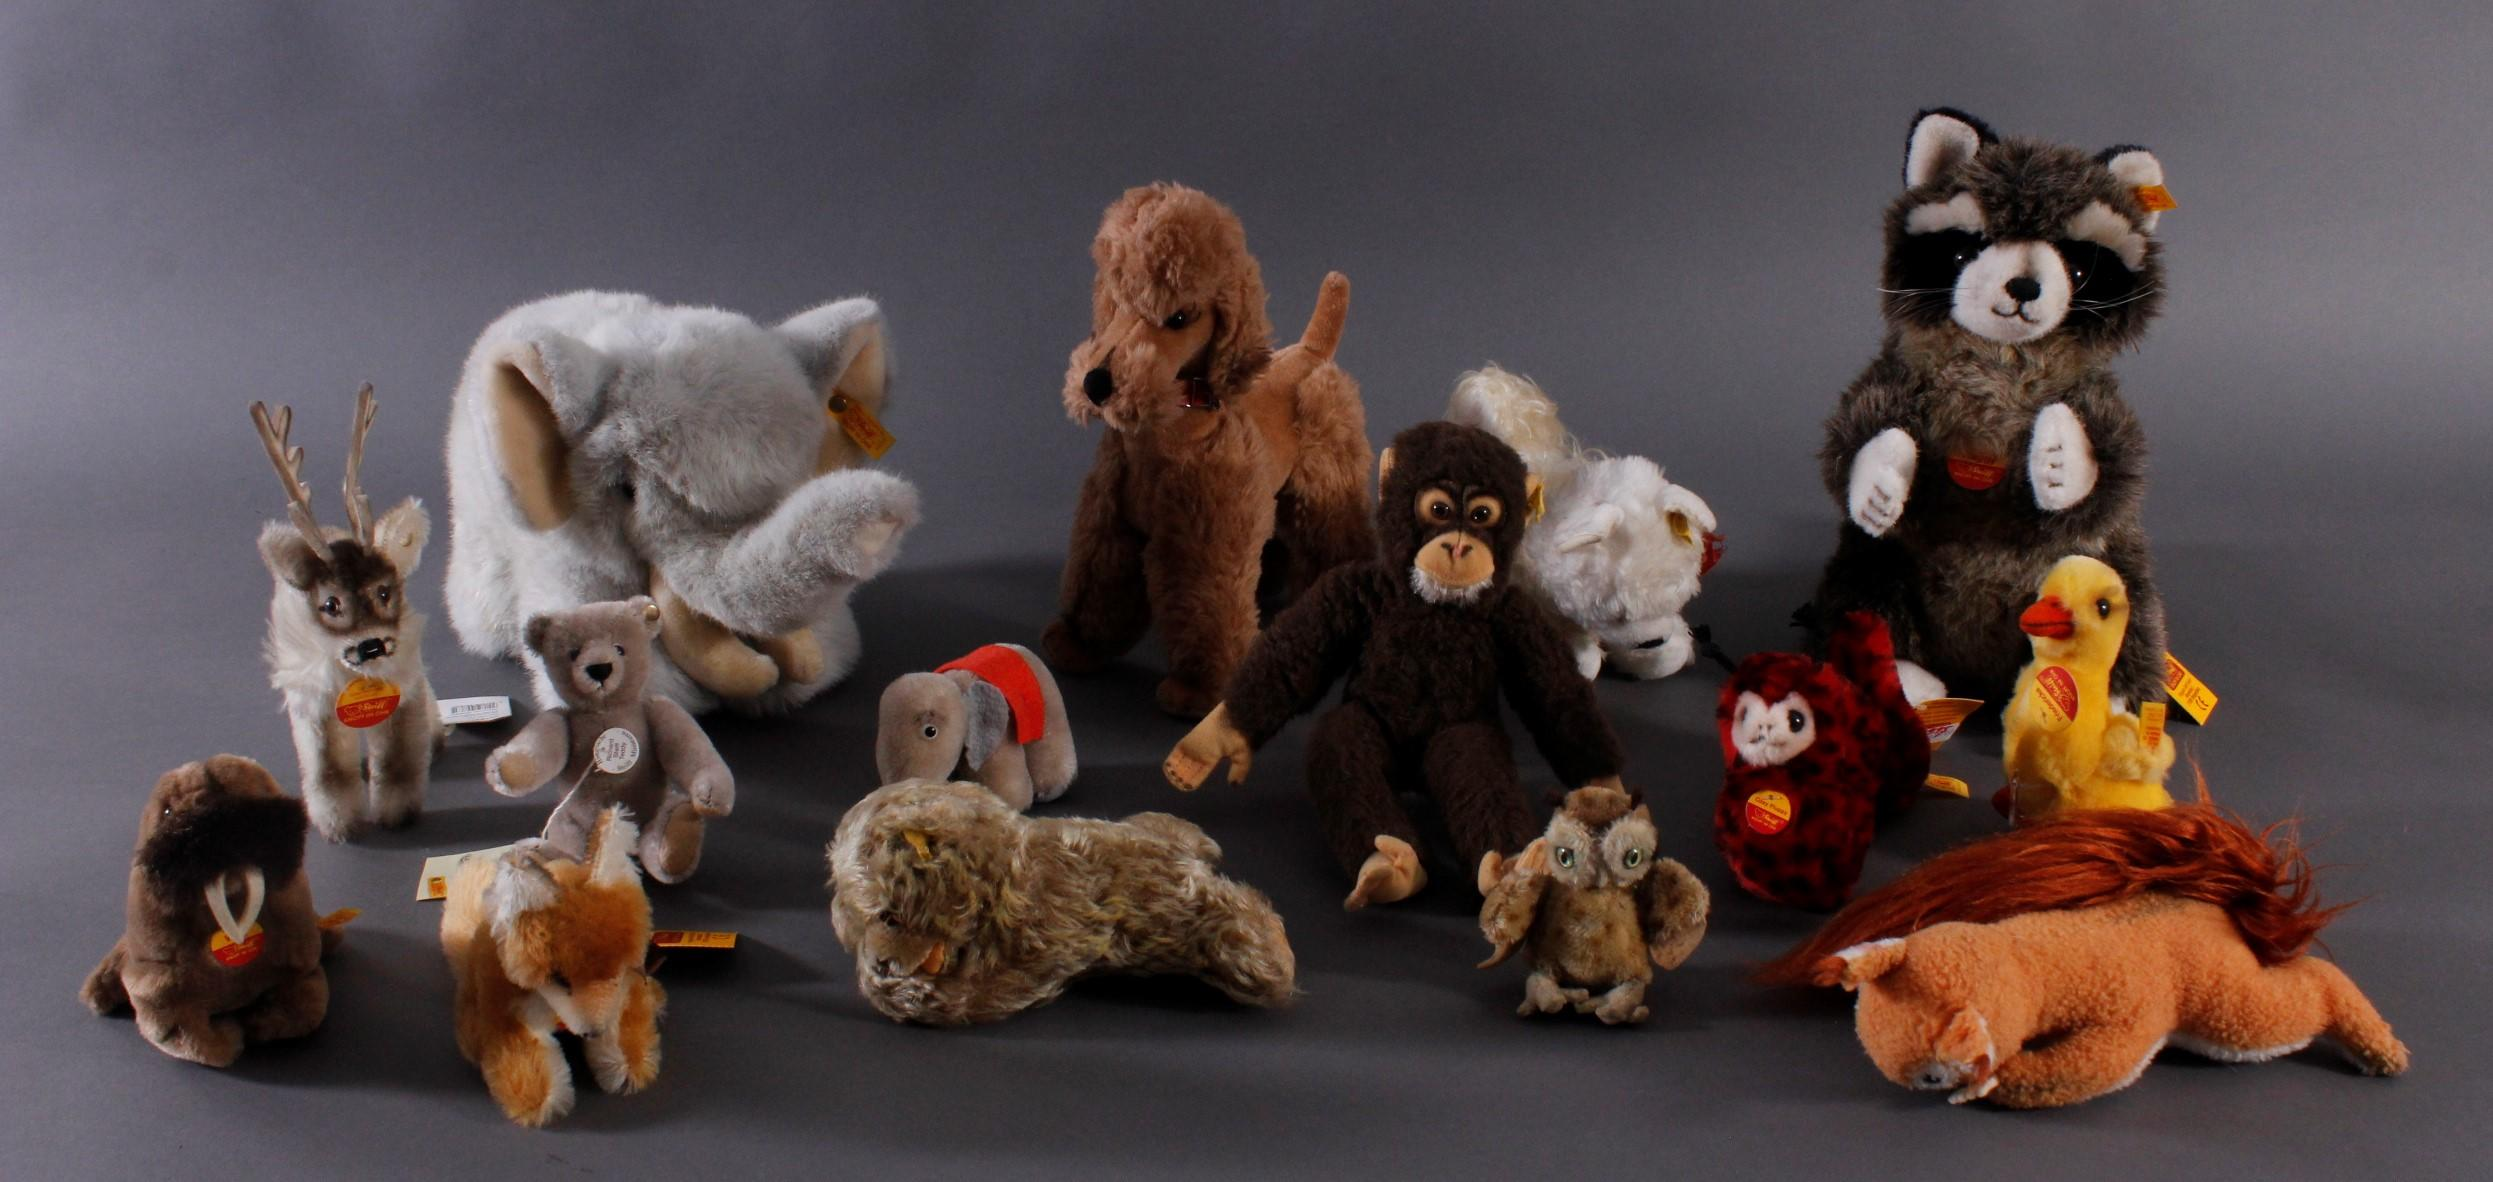 16 Steiff-Tiere